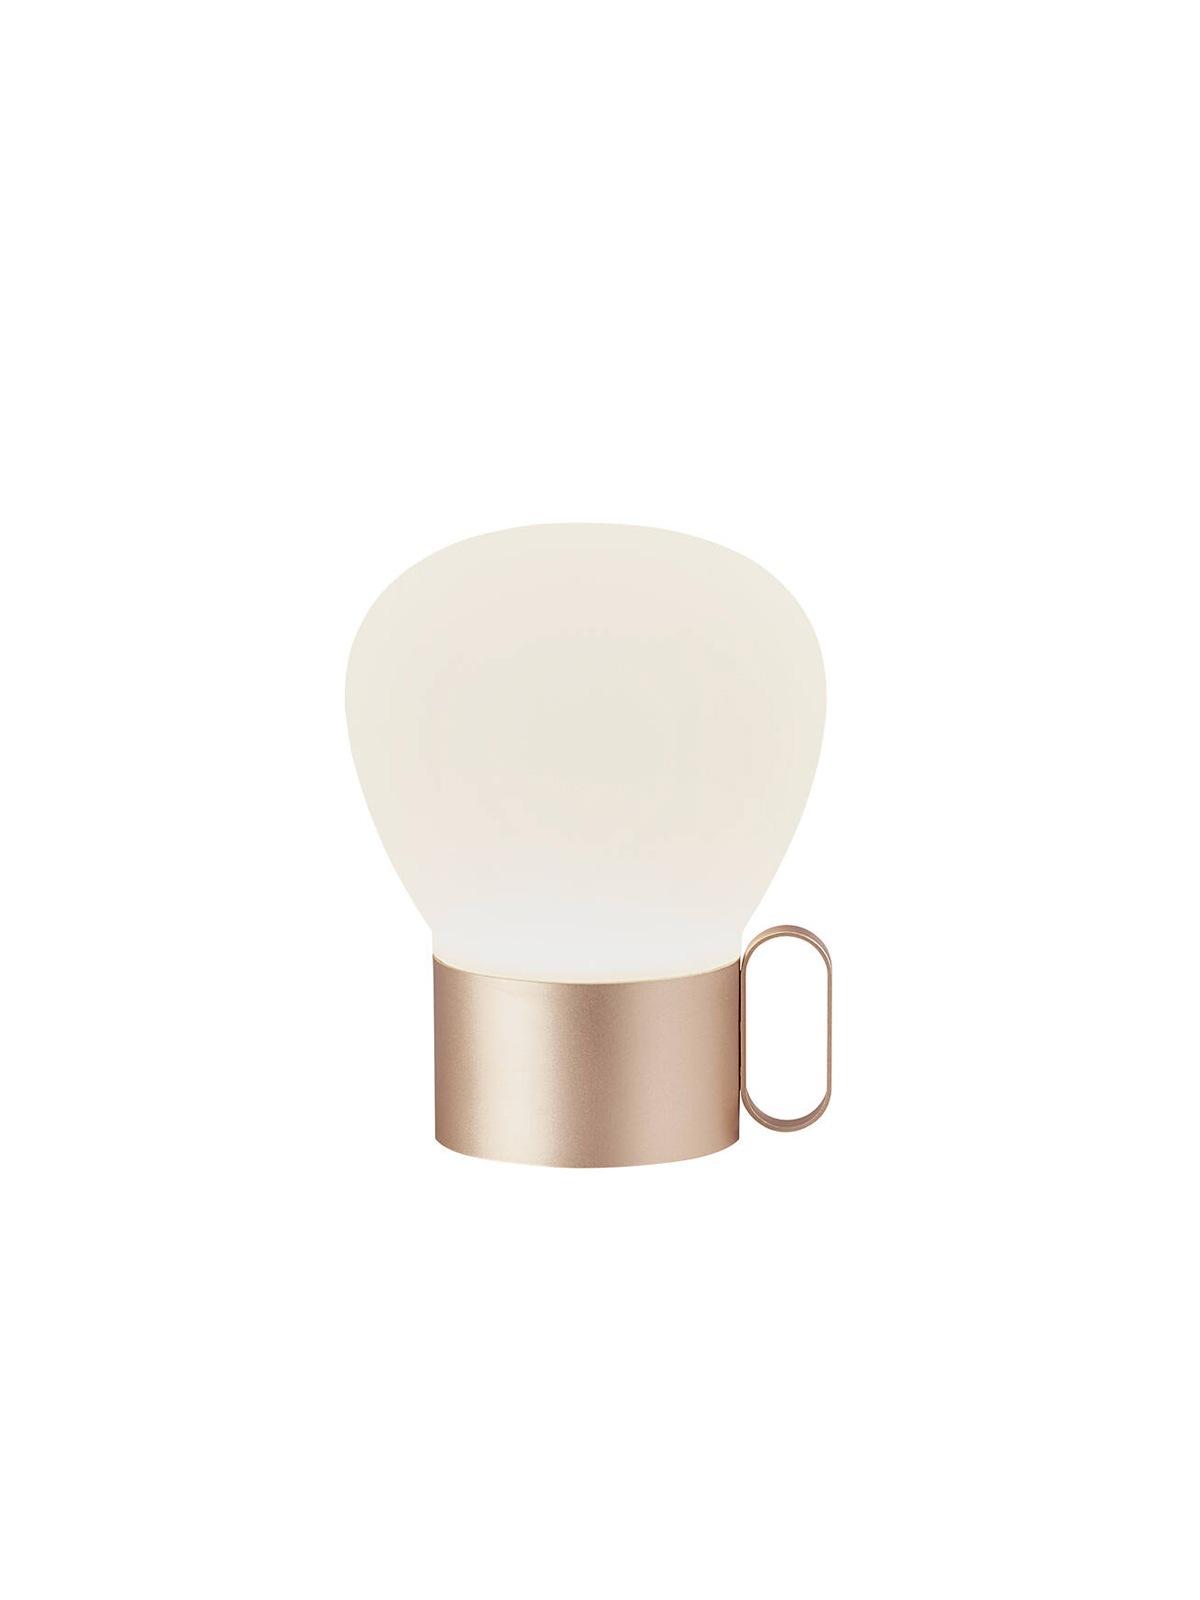 Design for the People Lampe Nuru Akkuleuchte DesignOrt Onlineshop Lampen